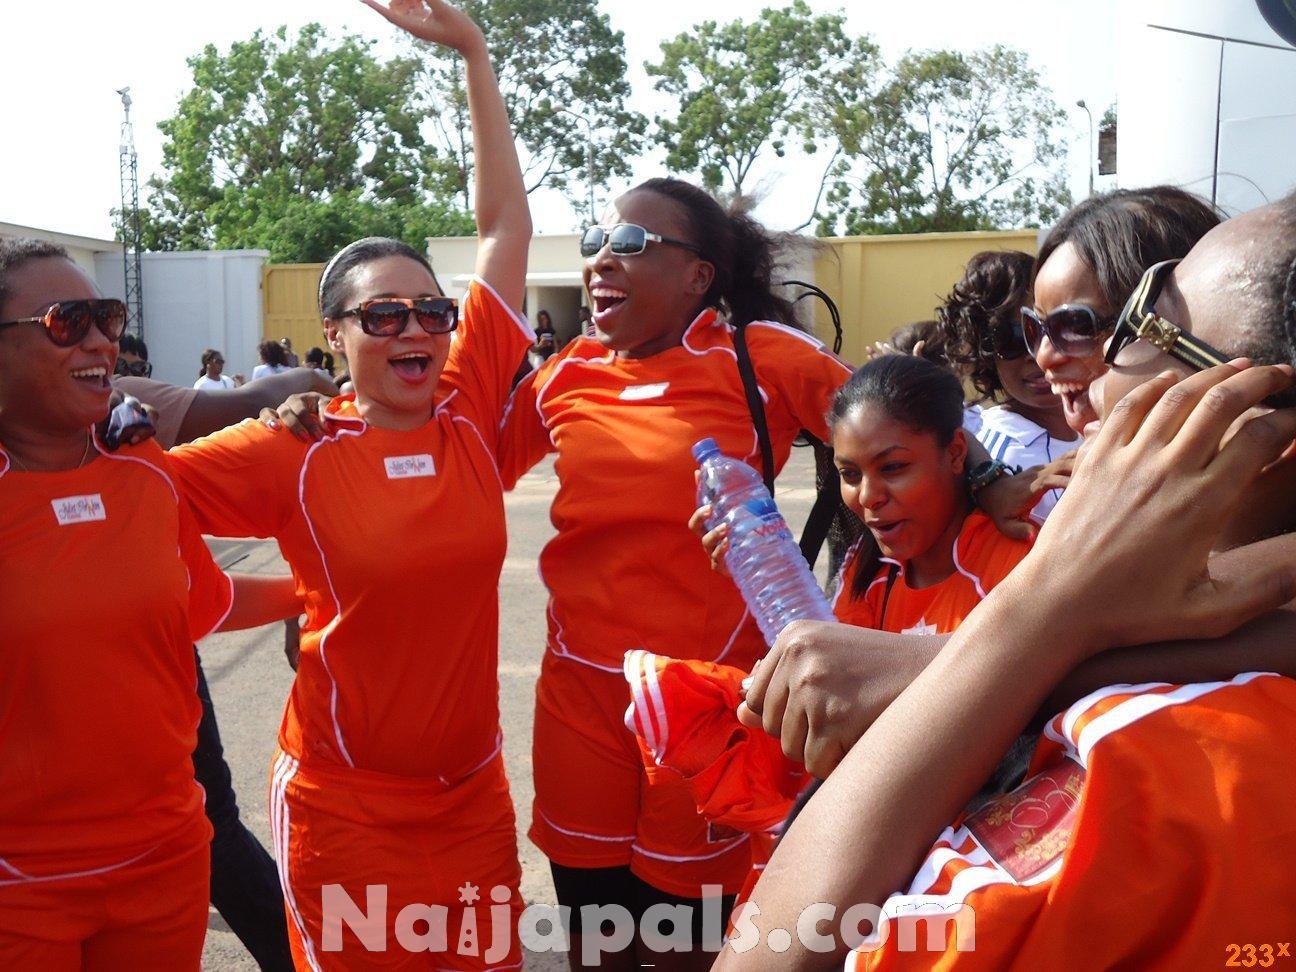 Ghana Female Celebrities Soccer Match 98